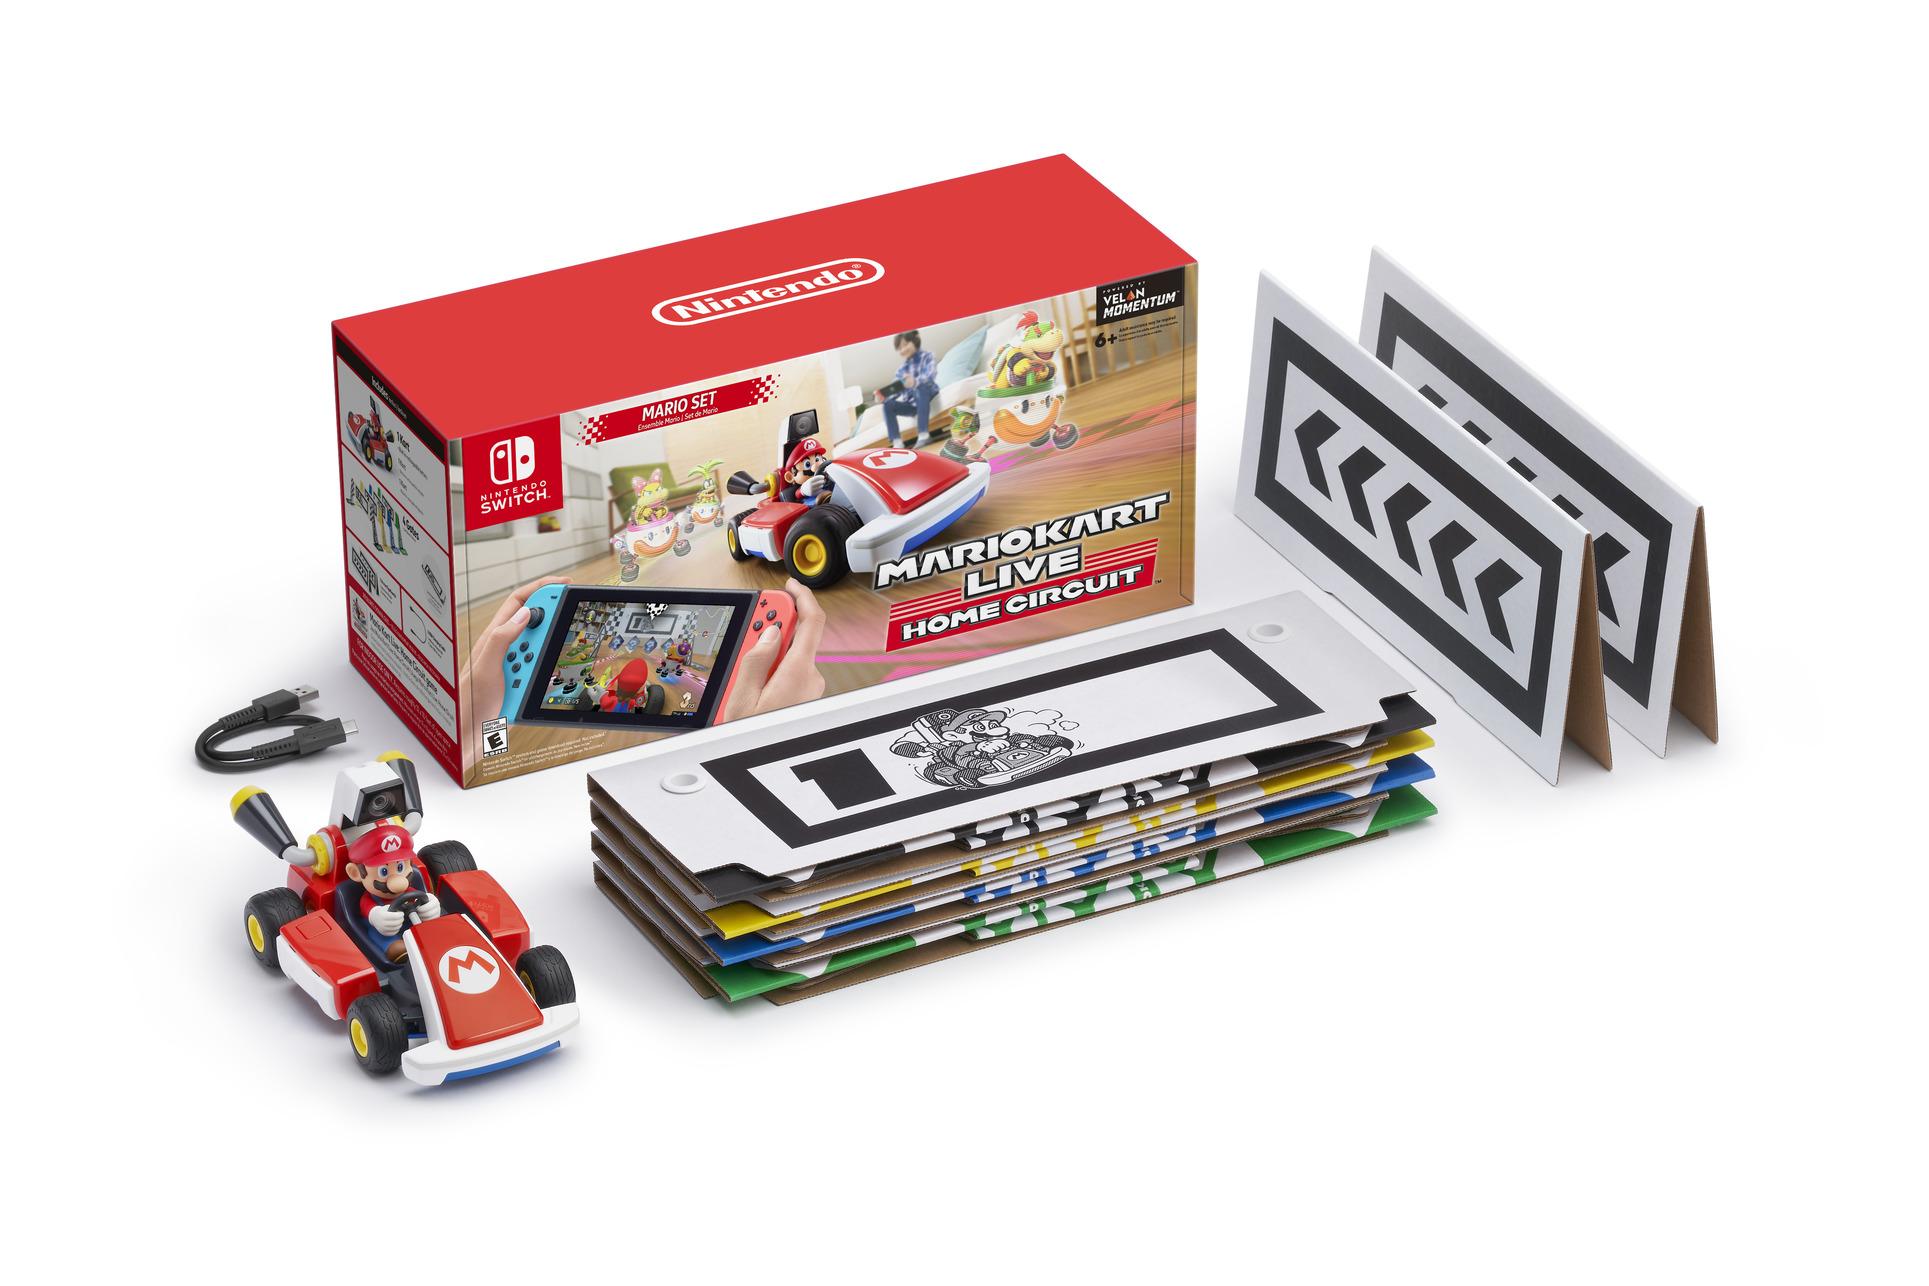 Mario Kart Live: Home Circuit – Mario Set, Nintendo, Nintendo Switch 00045496882839 – Walmart Inventory Checker – BrickSeek $40